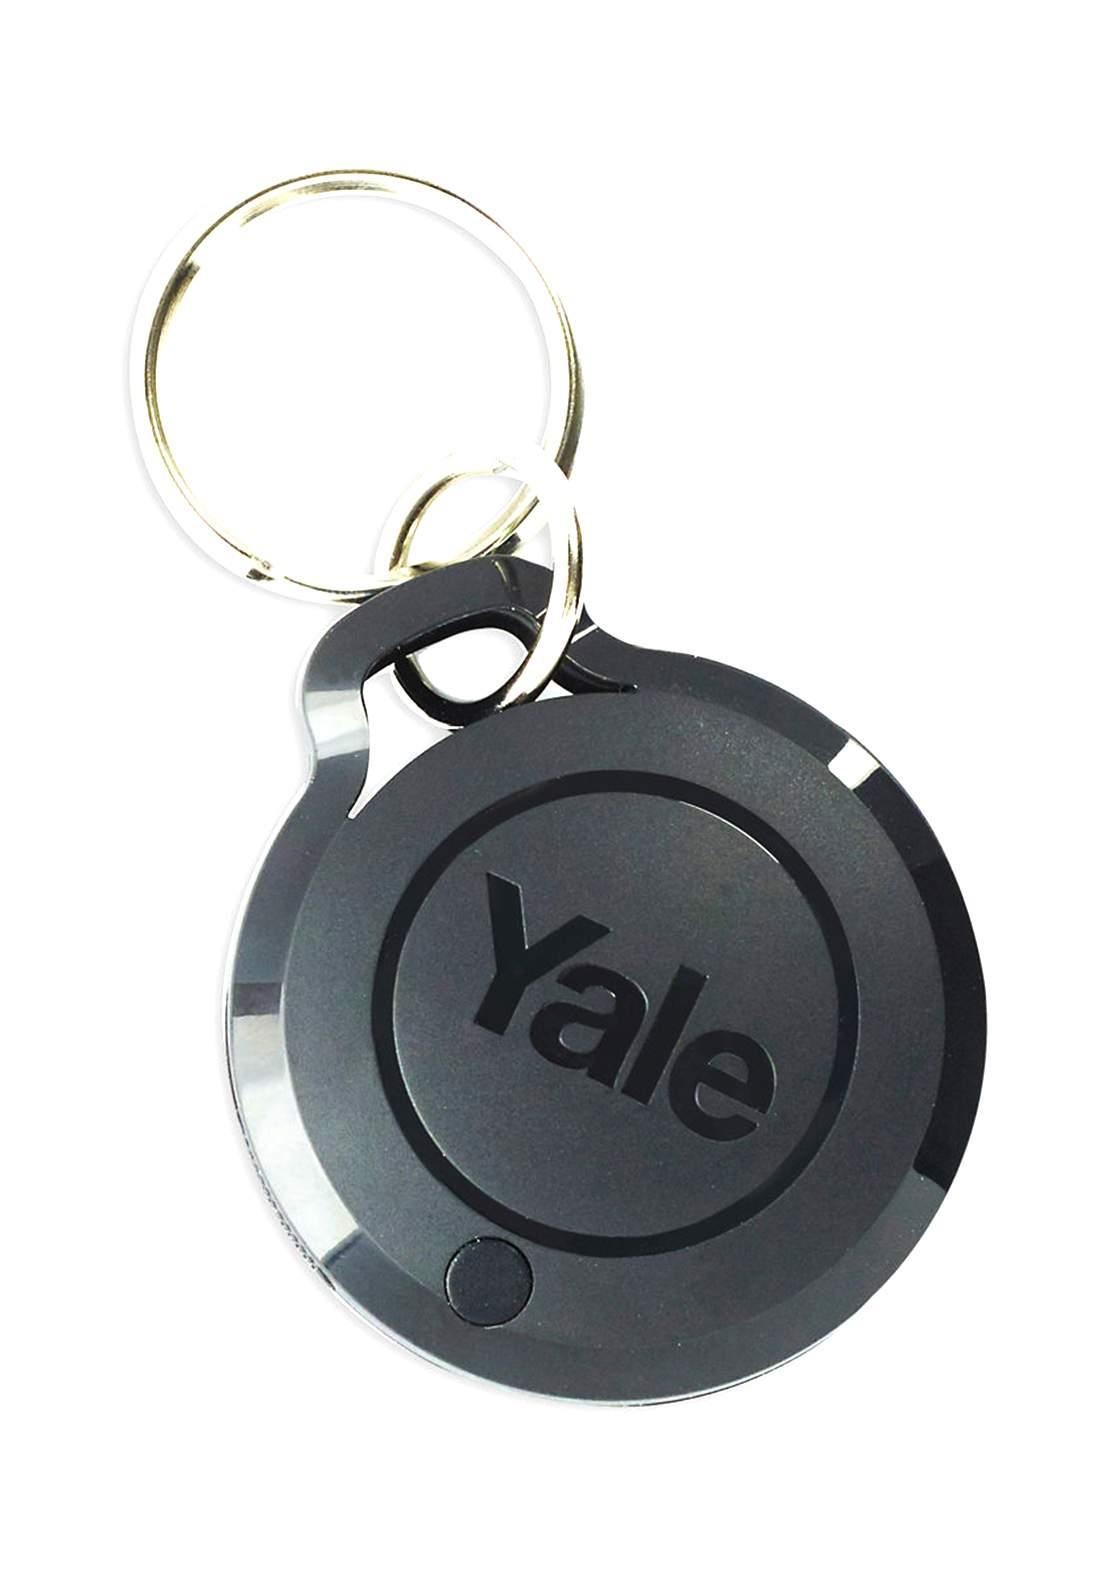 Yale AC-KF Wireless remote control key مفتاح التحكم عن بعد لاسلكي